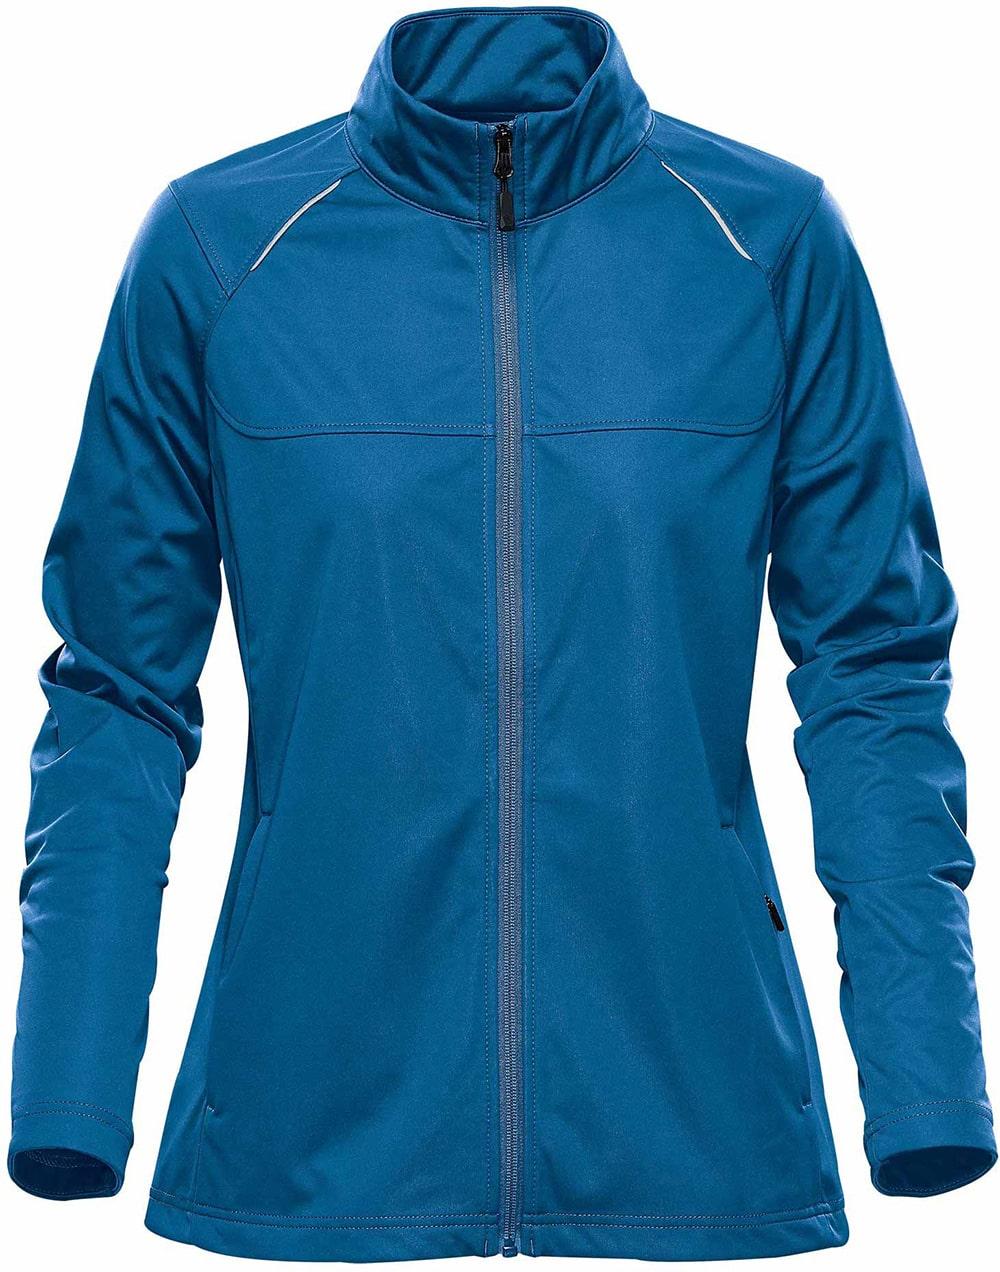 Picture of Stormtech Women's Greenwich Lightweight Softshell Jacket